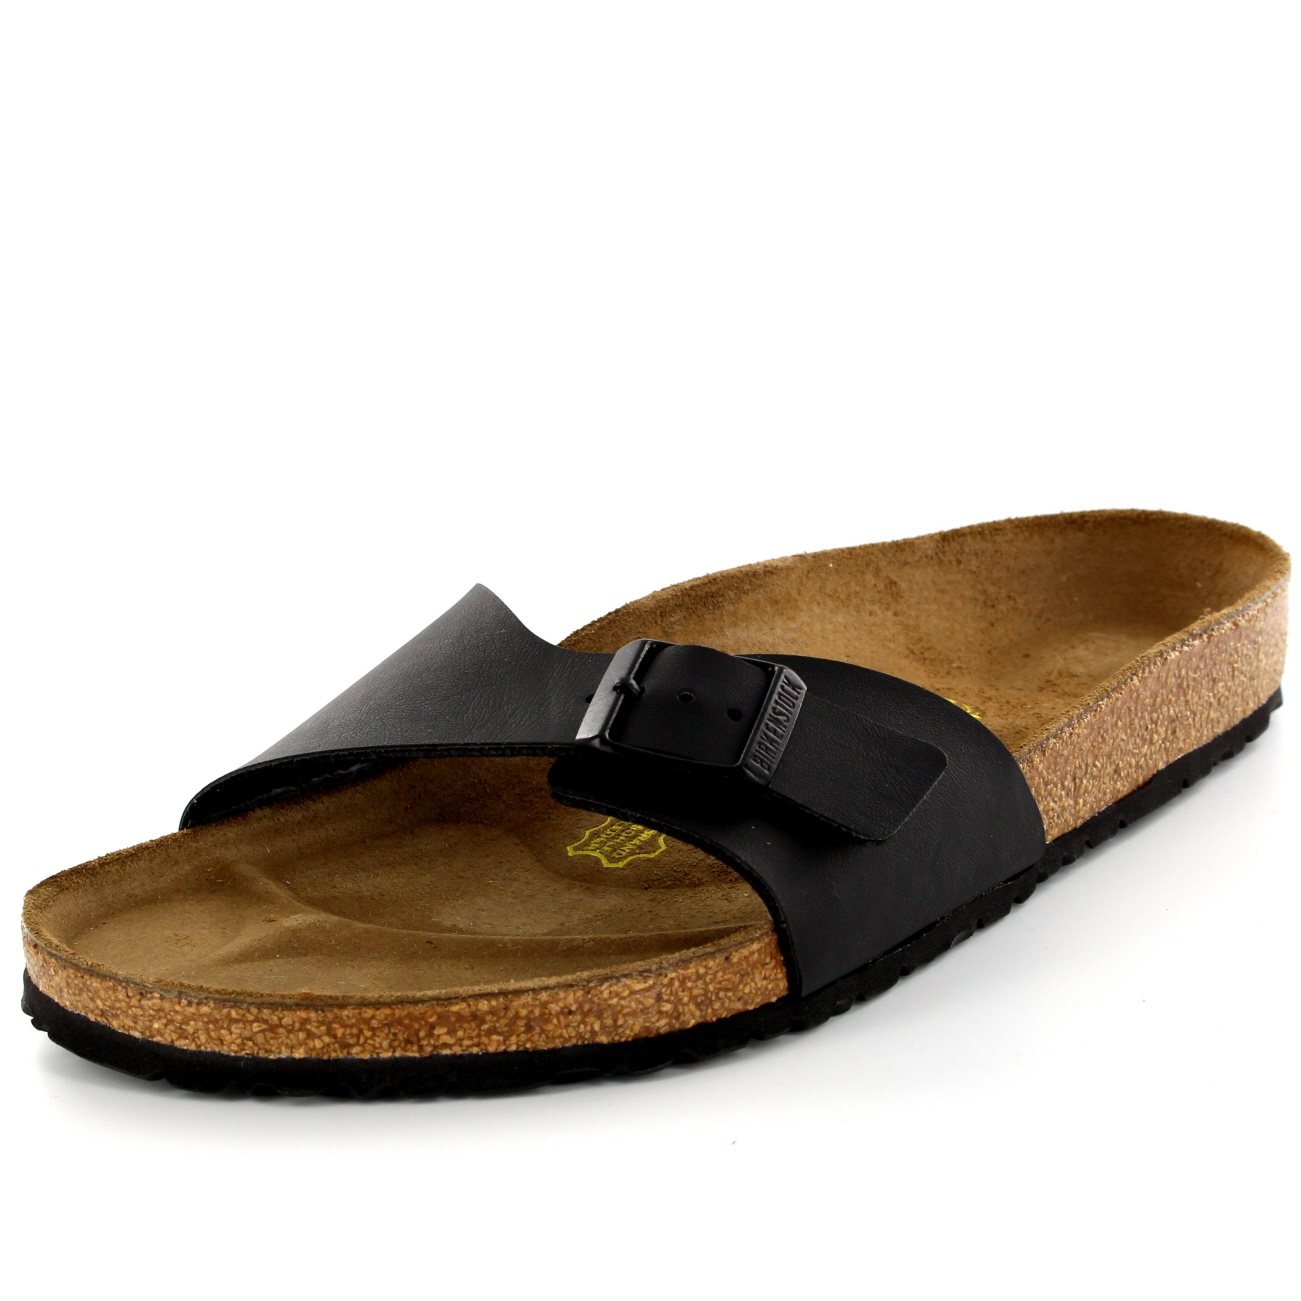 Unisex-Adults-Birkenstock-Madrid-Casual-Birko-Flor-Beach-Summer-Sandals-UK-2-13 thumbnail 12